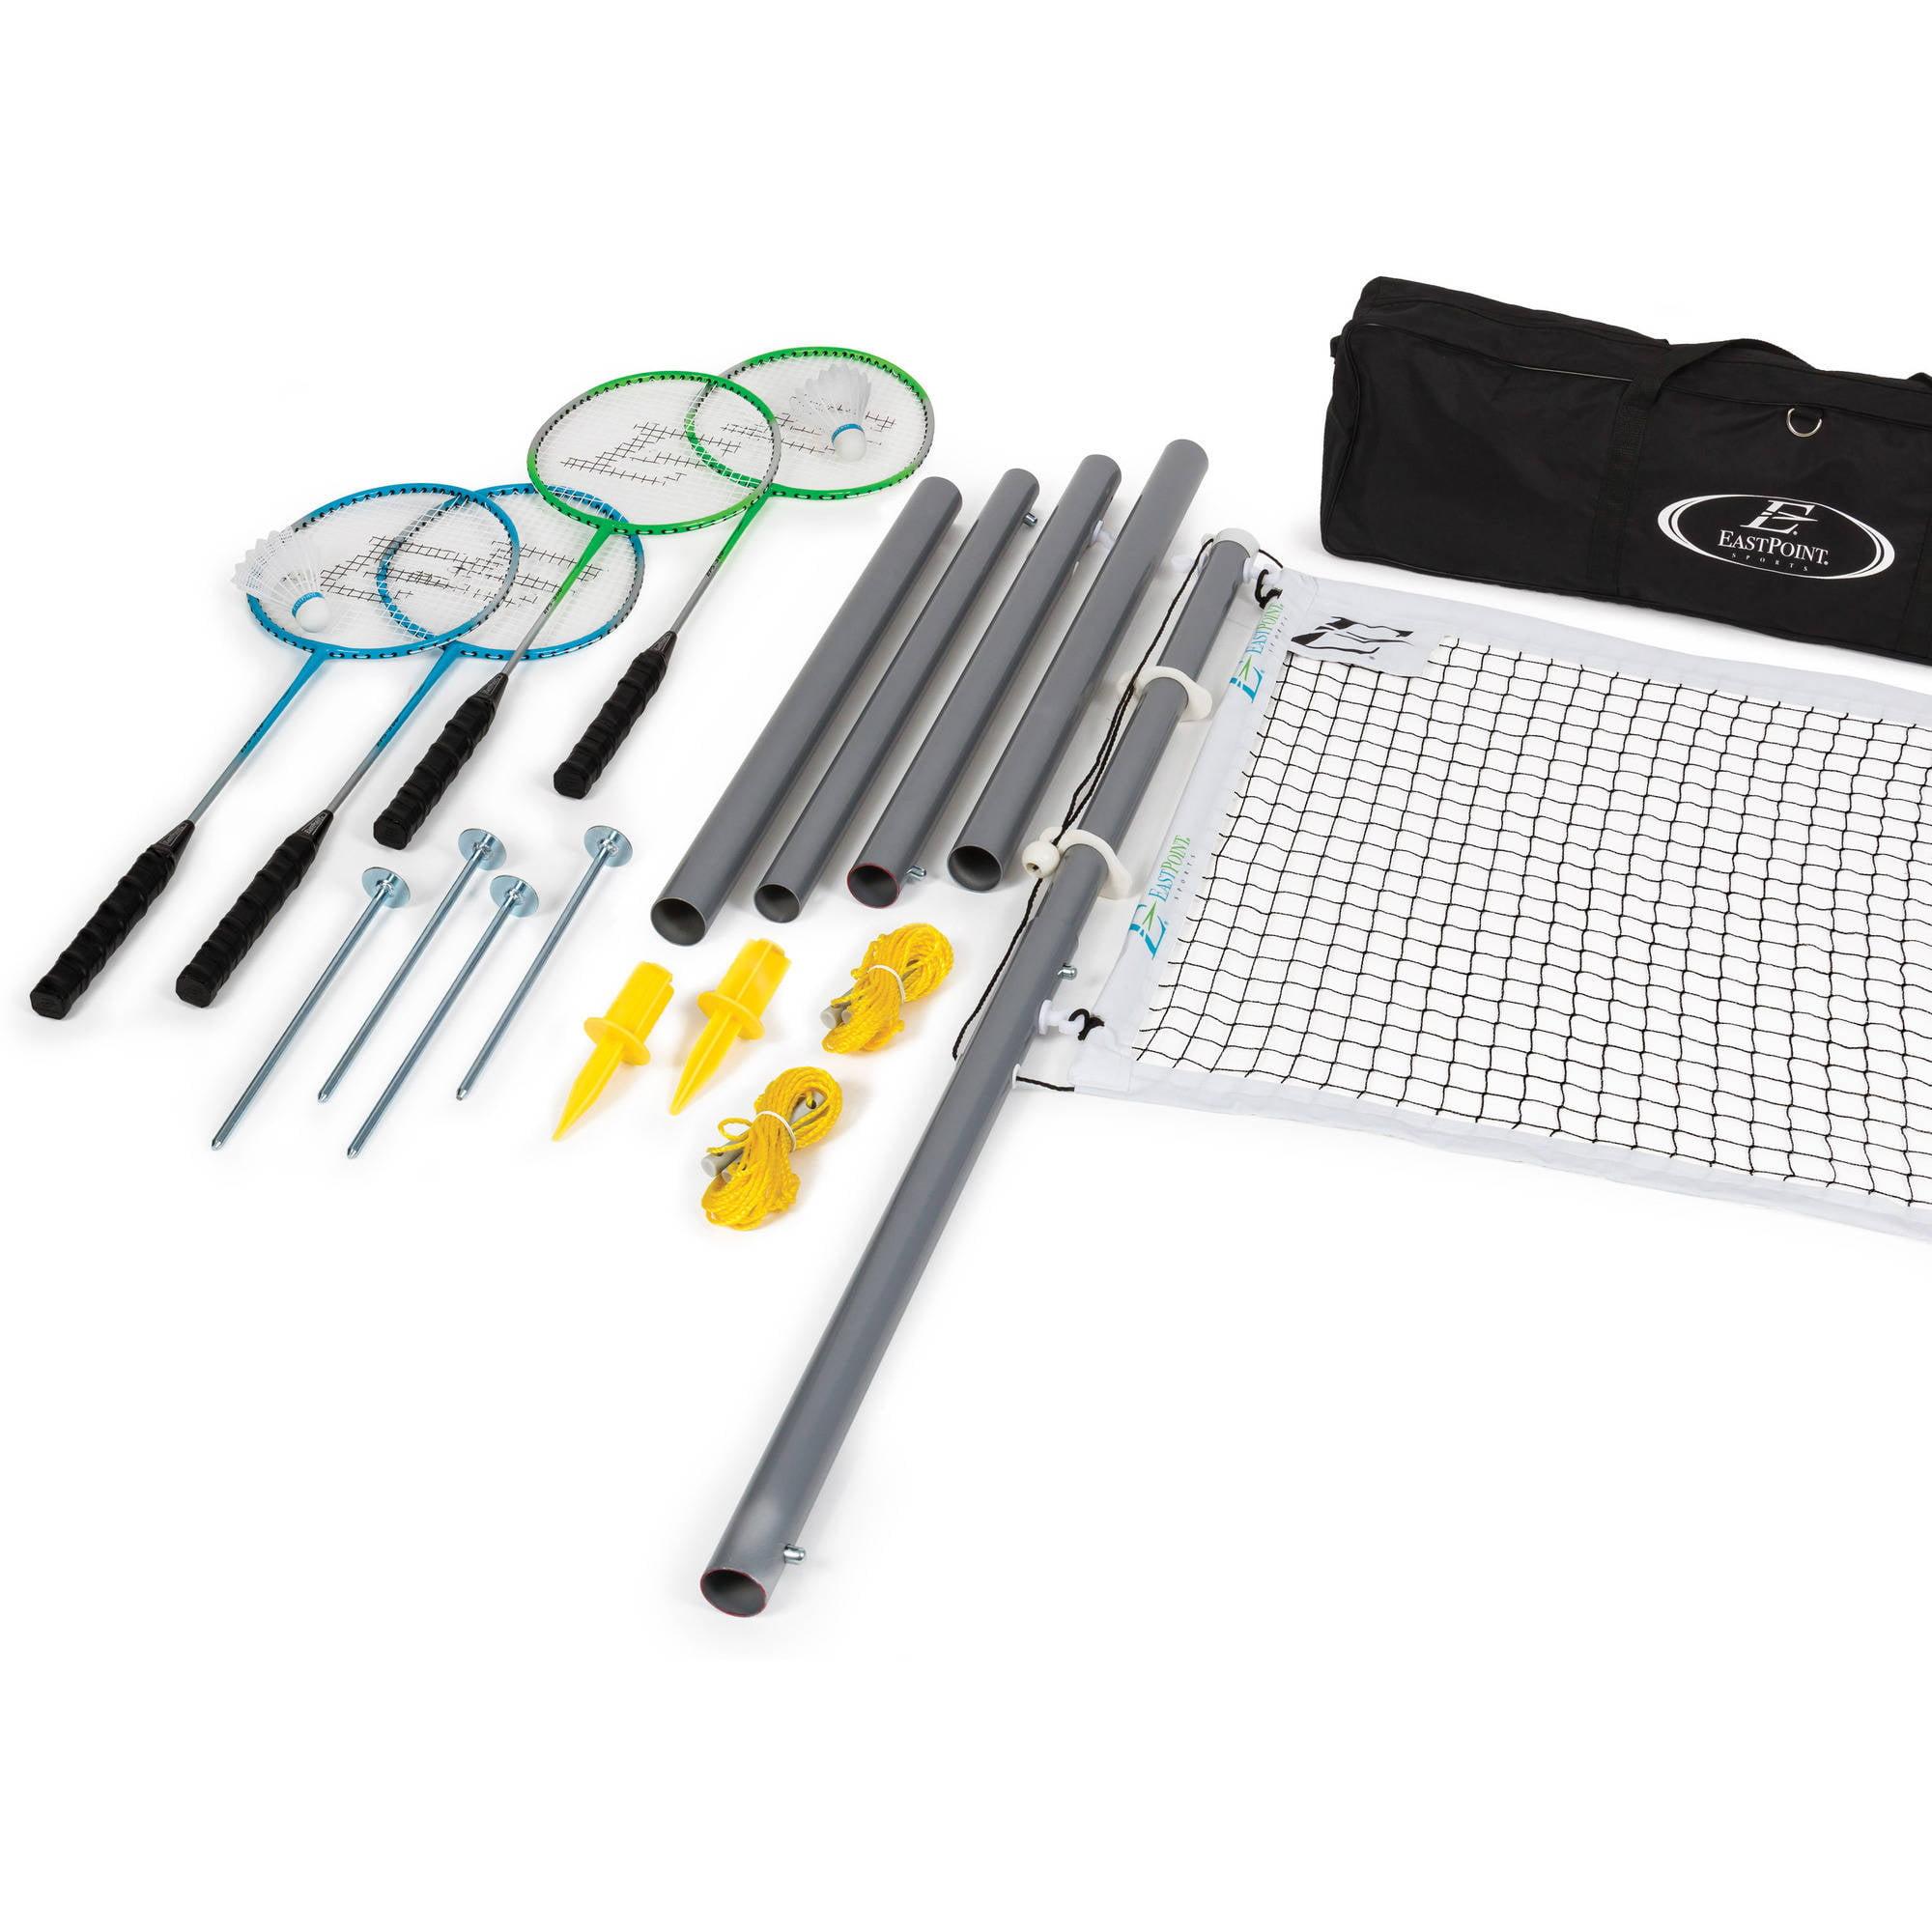 EastPoint Sports Deluxe Badminton Set, Aluminum Poles by Eastpoint Sports